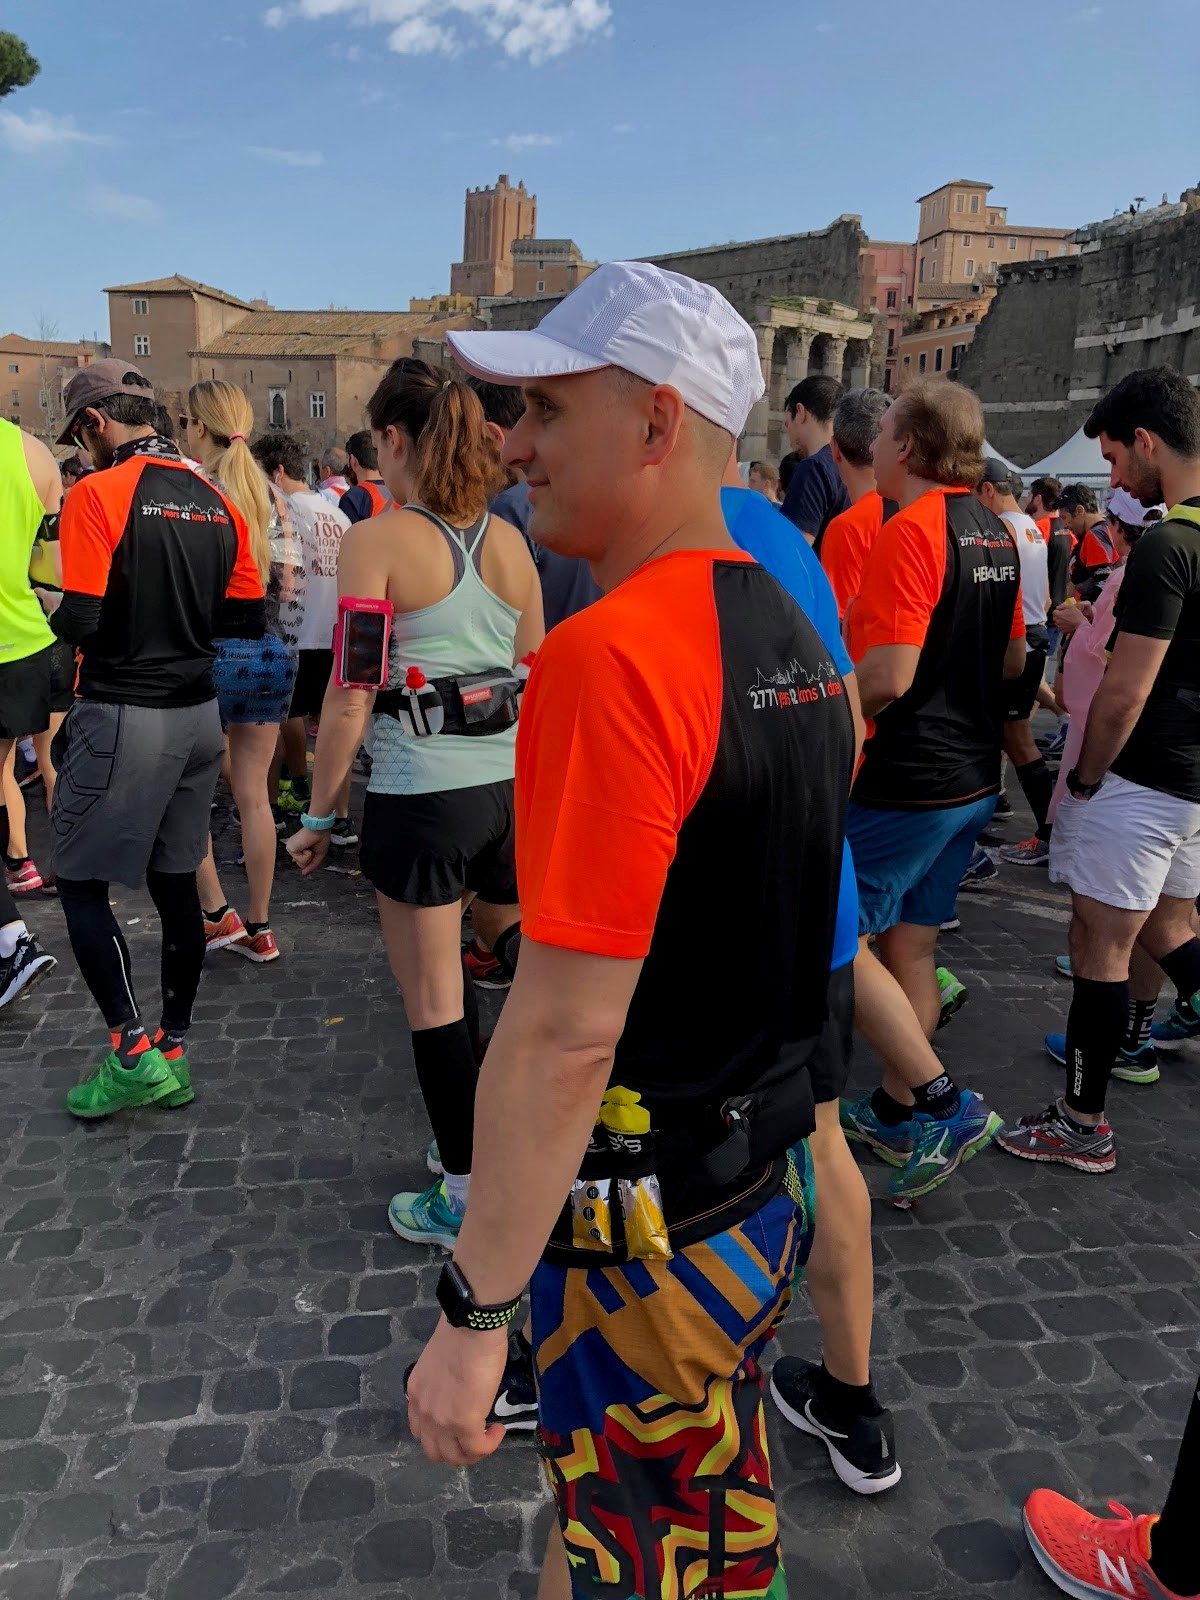 [Хабра-оффтоп] Maratona di Roma, или первый марафон для ИТ-шника - 15